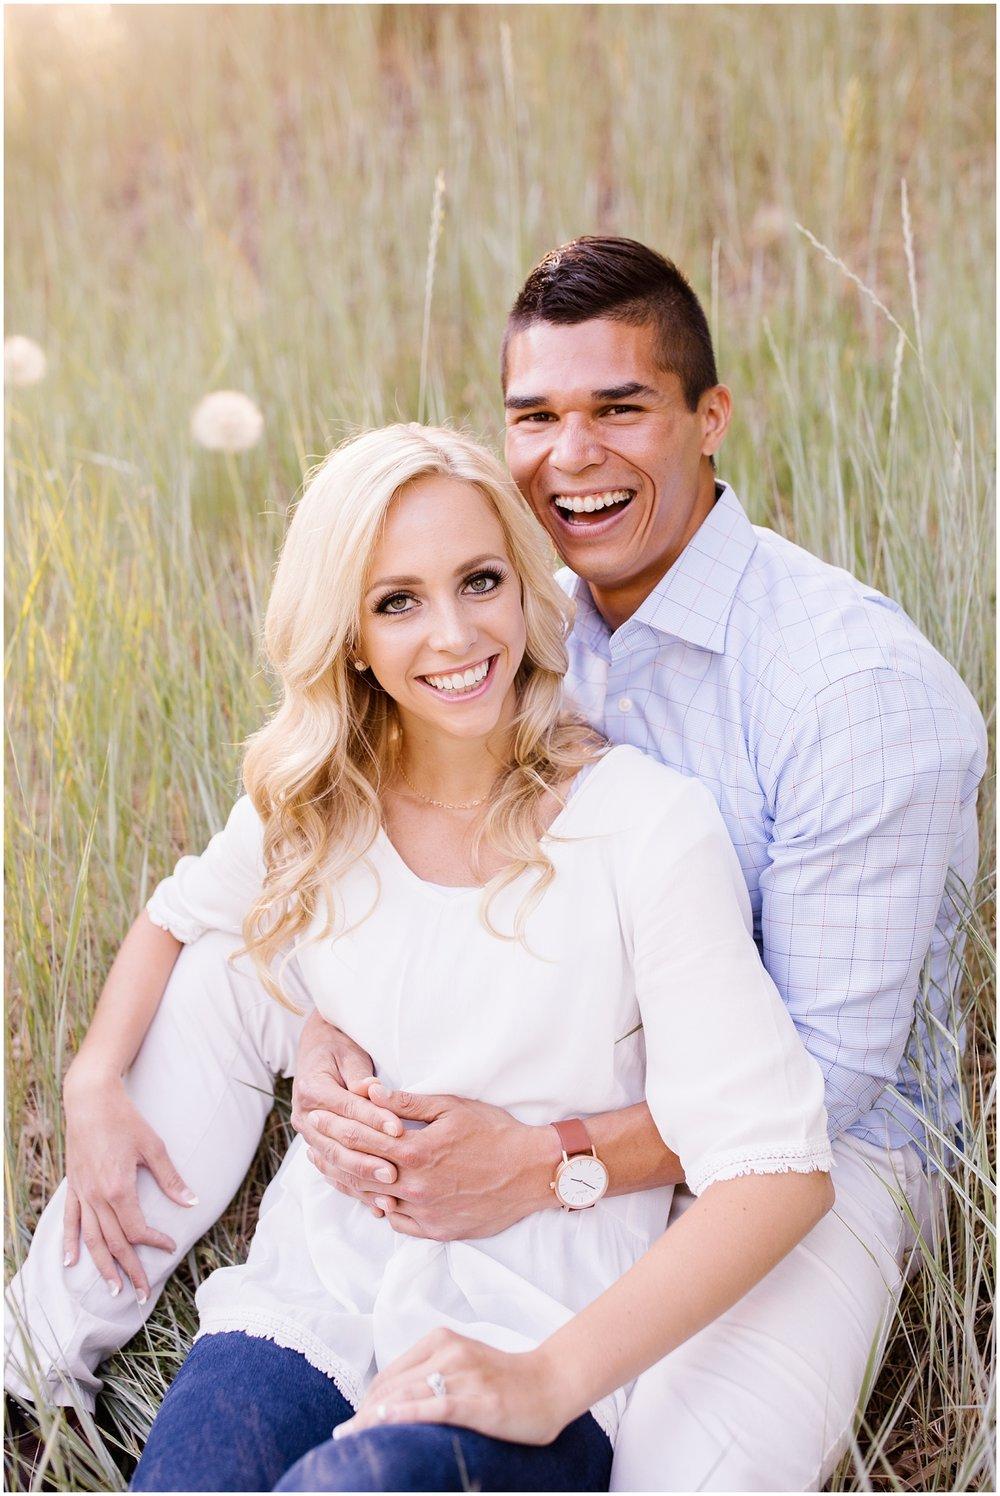 HCengagements-4_Lizzie-B-Imagery-Utah-Wedding-Photographer-Park-City-Salt-Lake-City-Payson-Canyon-Engagement-Session.jpg